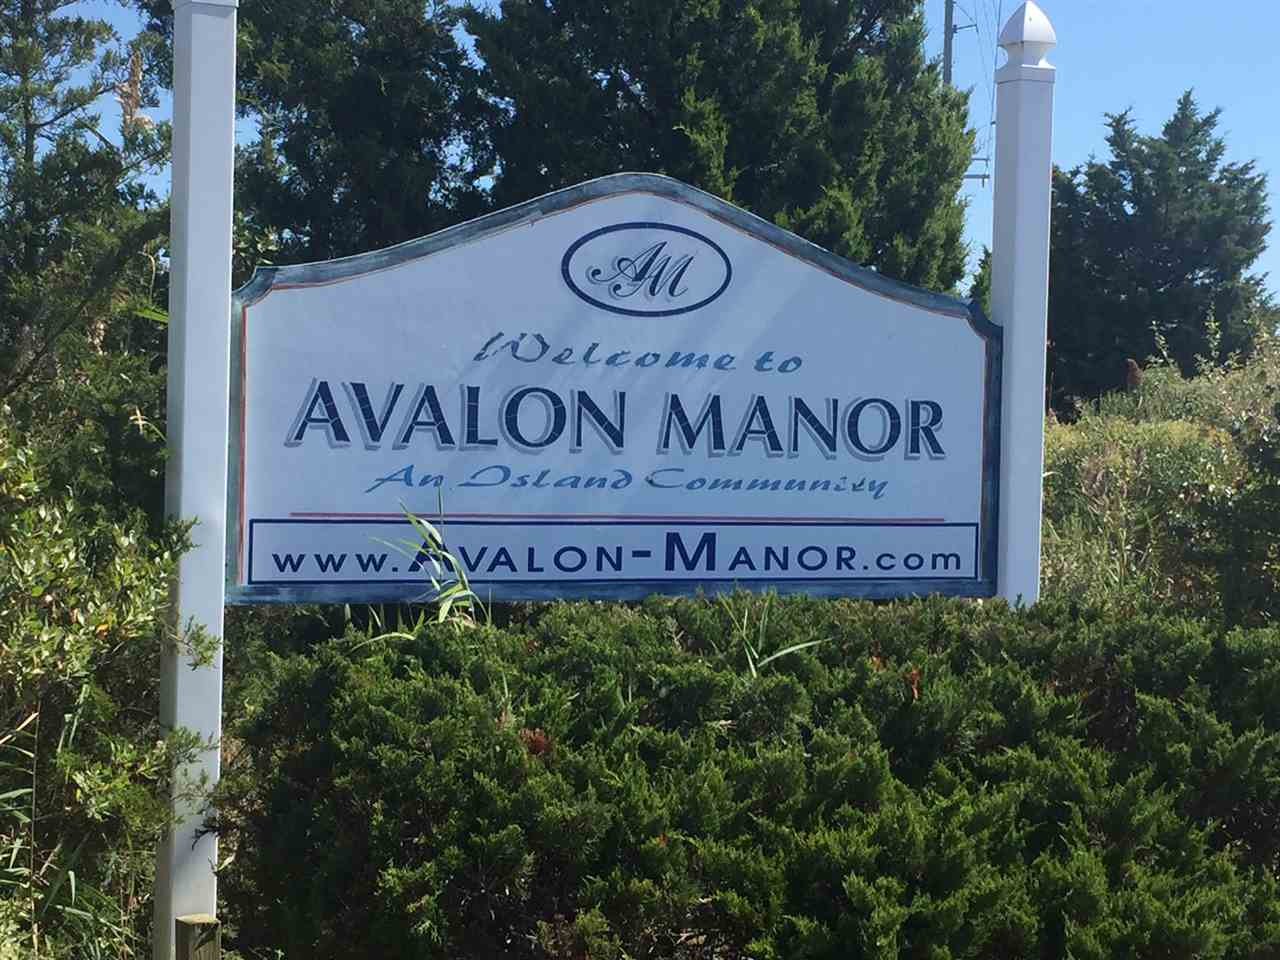 463 Avalon Blvd, Avalon Manor,NJ - Picture 4